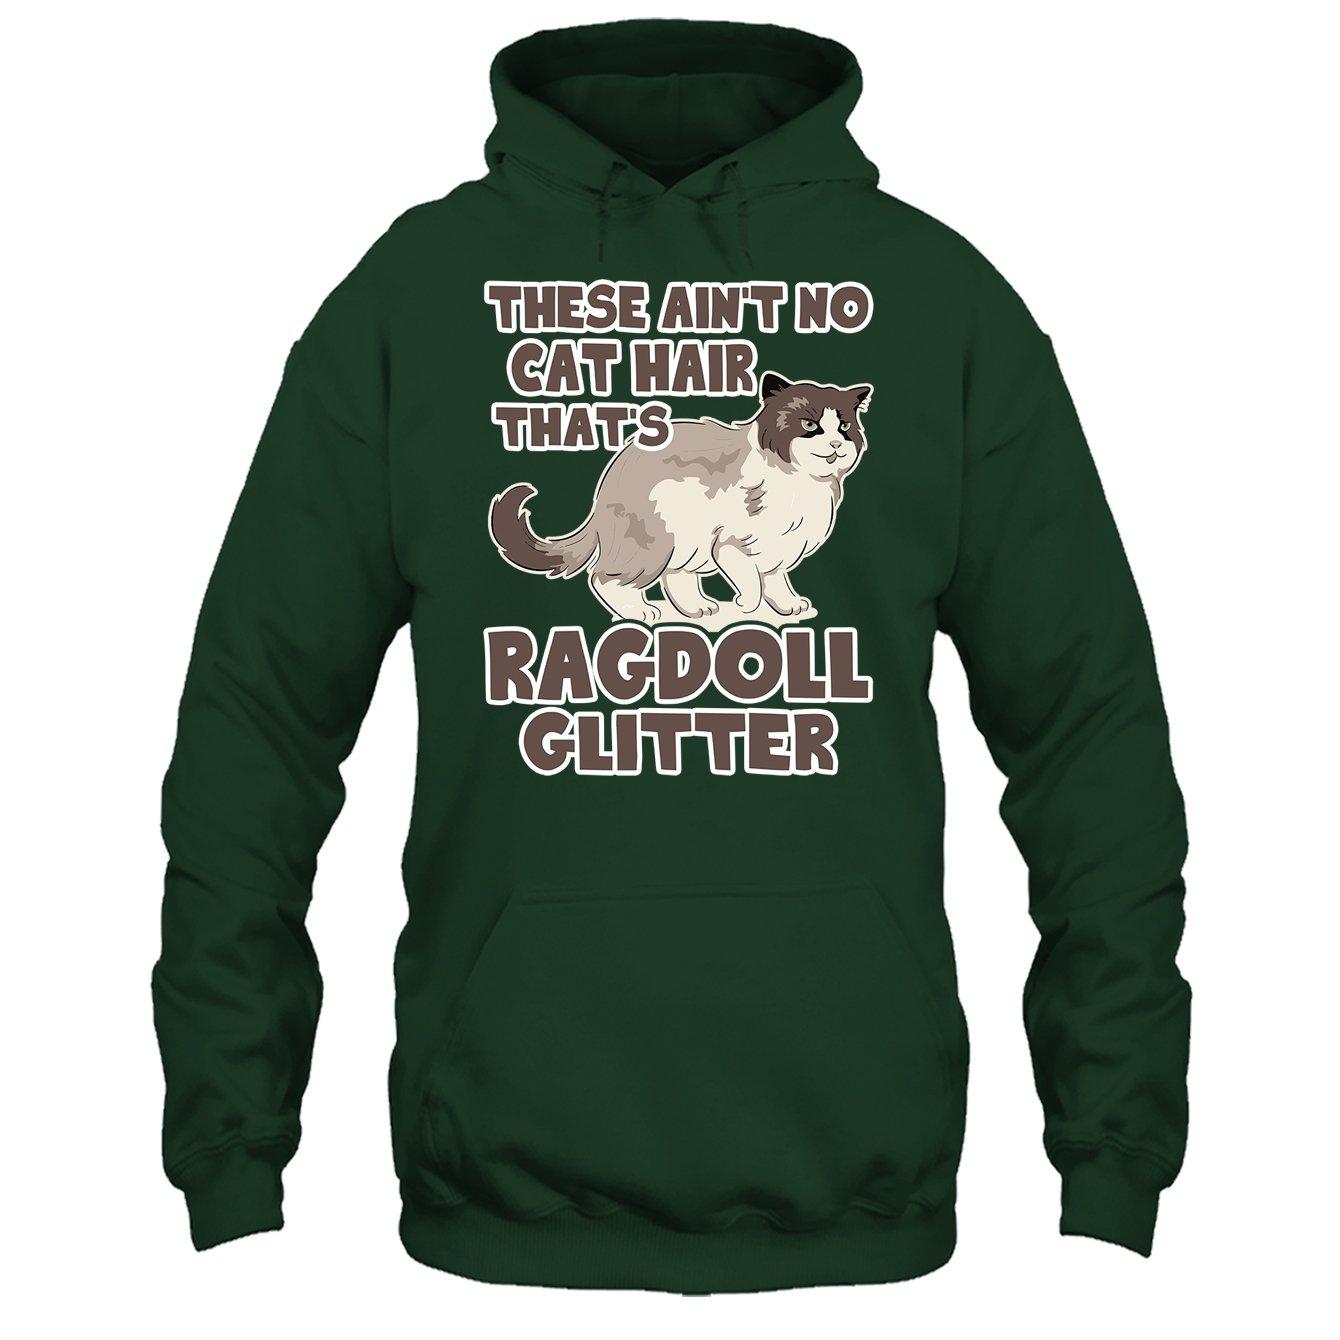 Addblue Ragdoll Tshirt Design Thats Ragdoll Glitter T Shirt